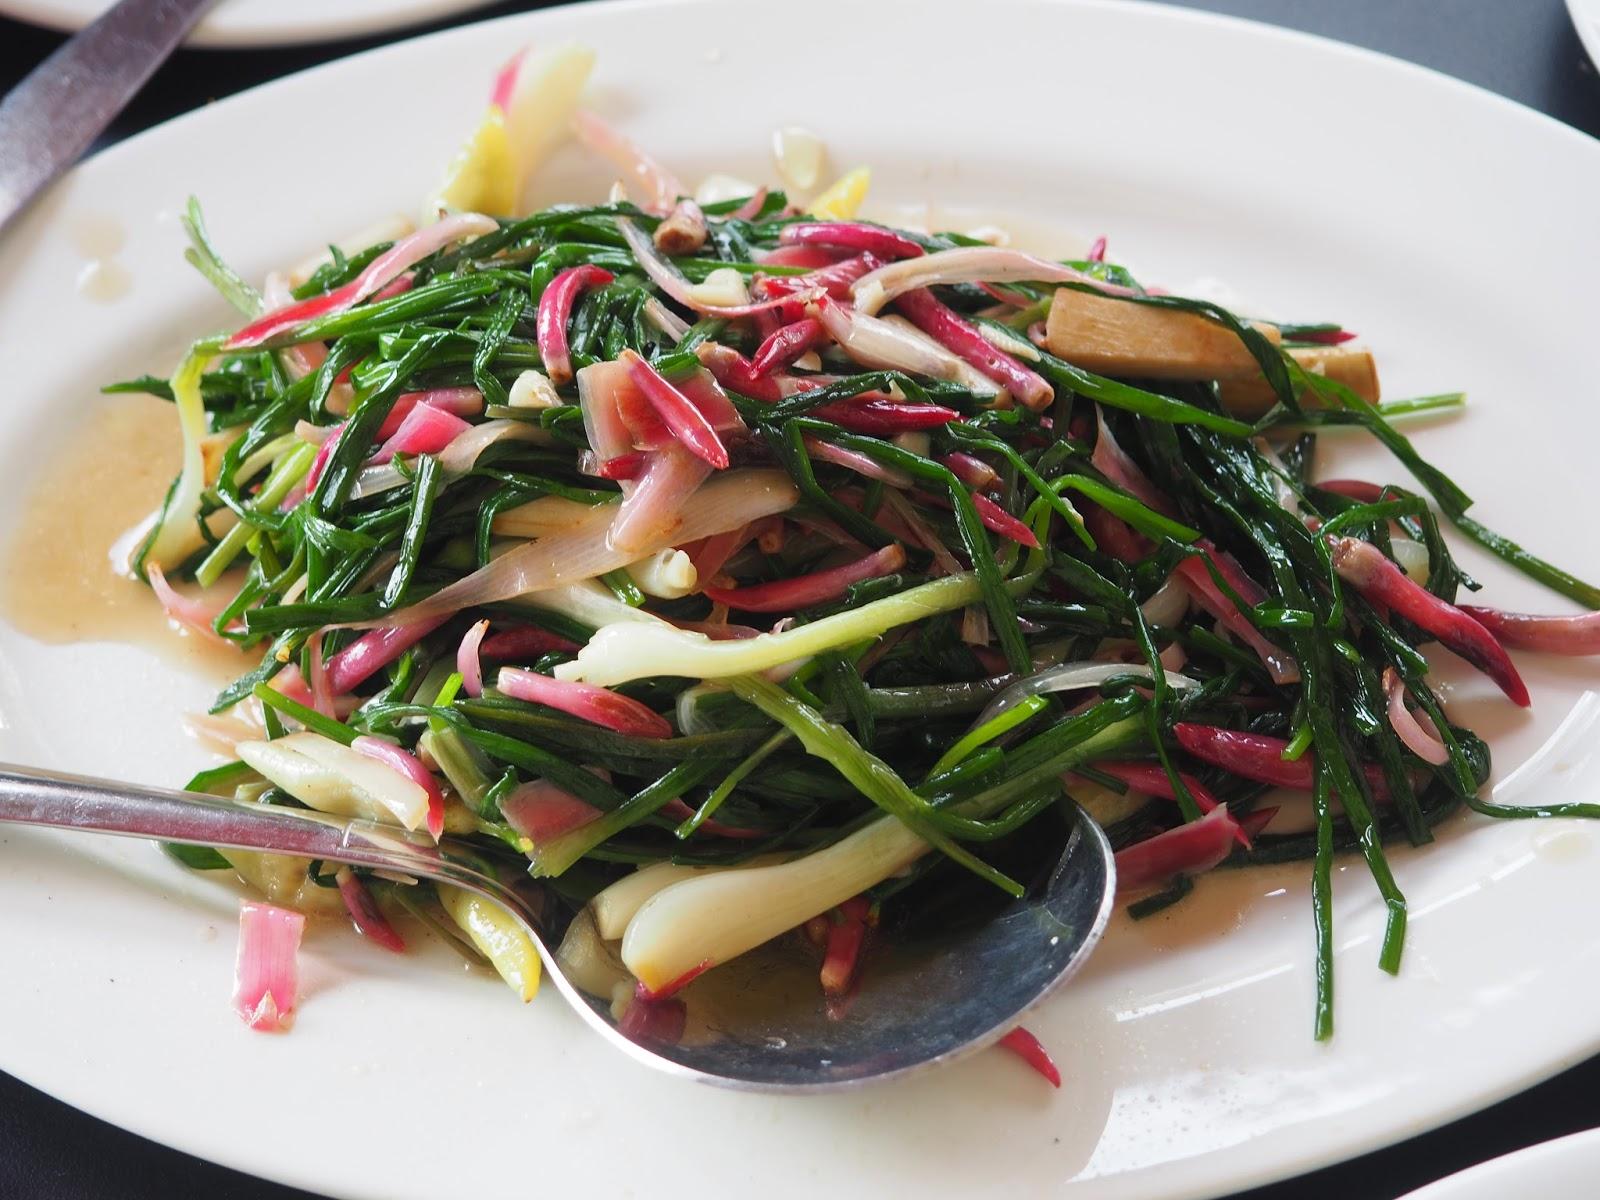 Malaysia borneo ranau kundasang vegetables foodie